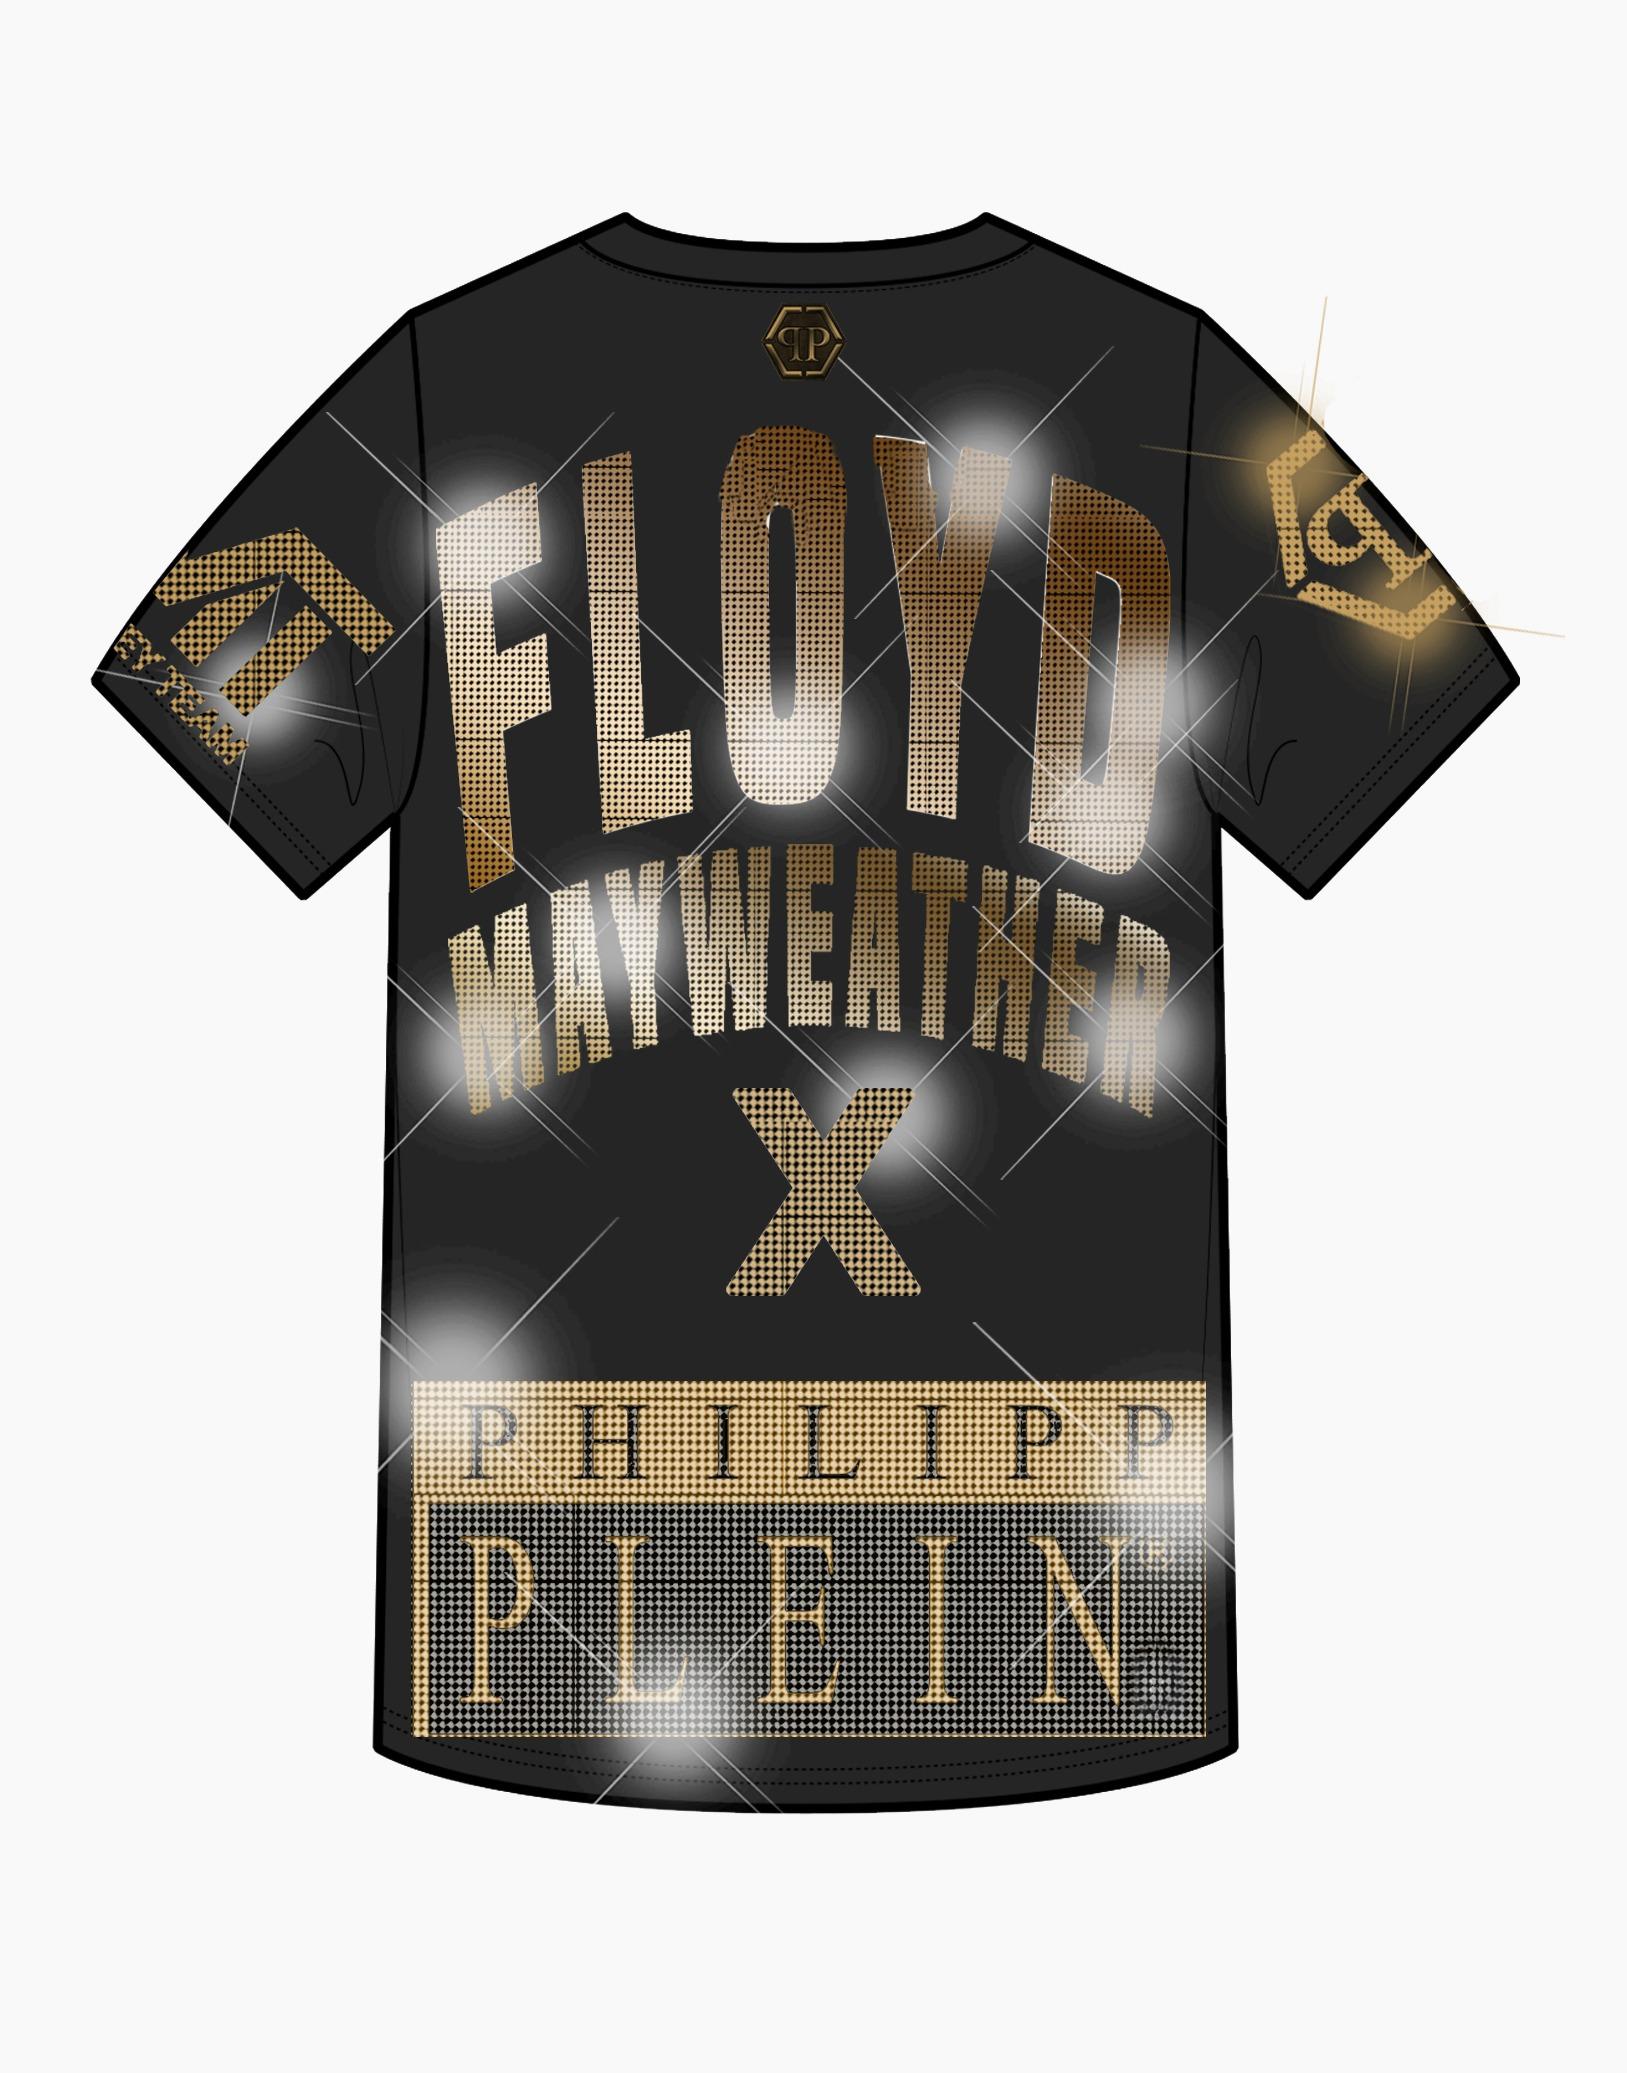 Philipp Plein x Floyd Mayweather